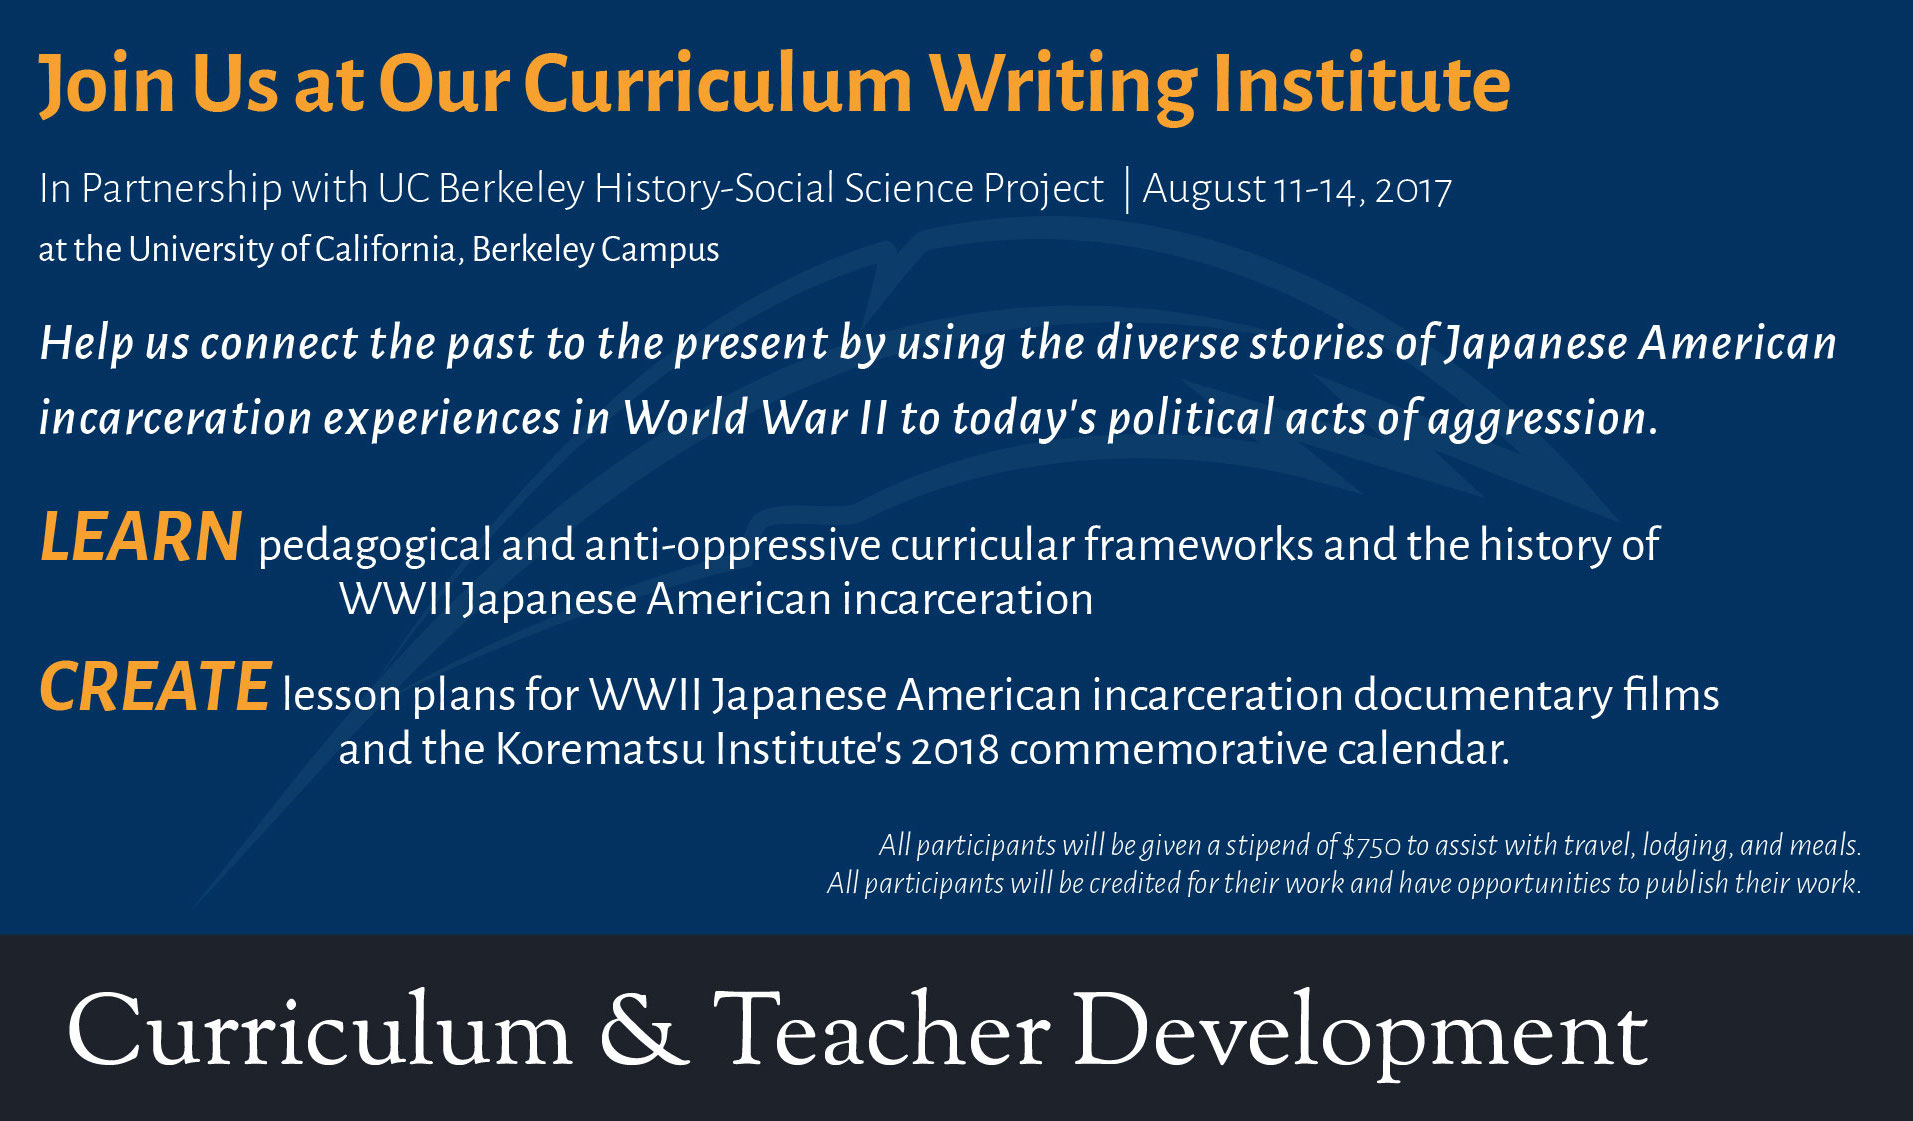 KI_writing institute_teacher development.jpg